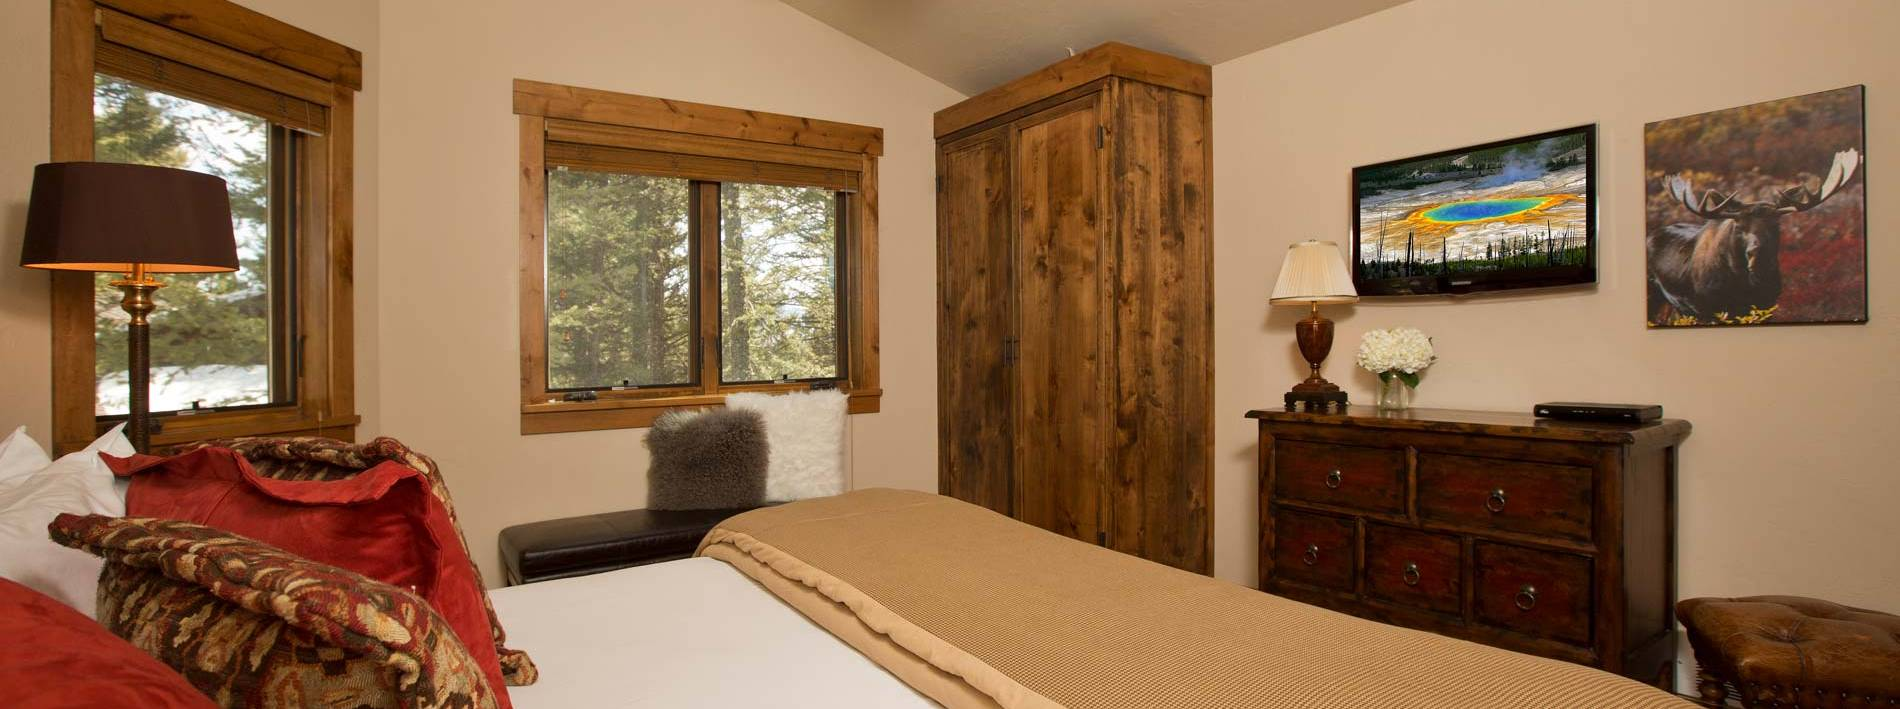 Spacious king bedroom in the Blue Moose Lodge in Teton Village